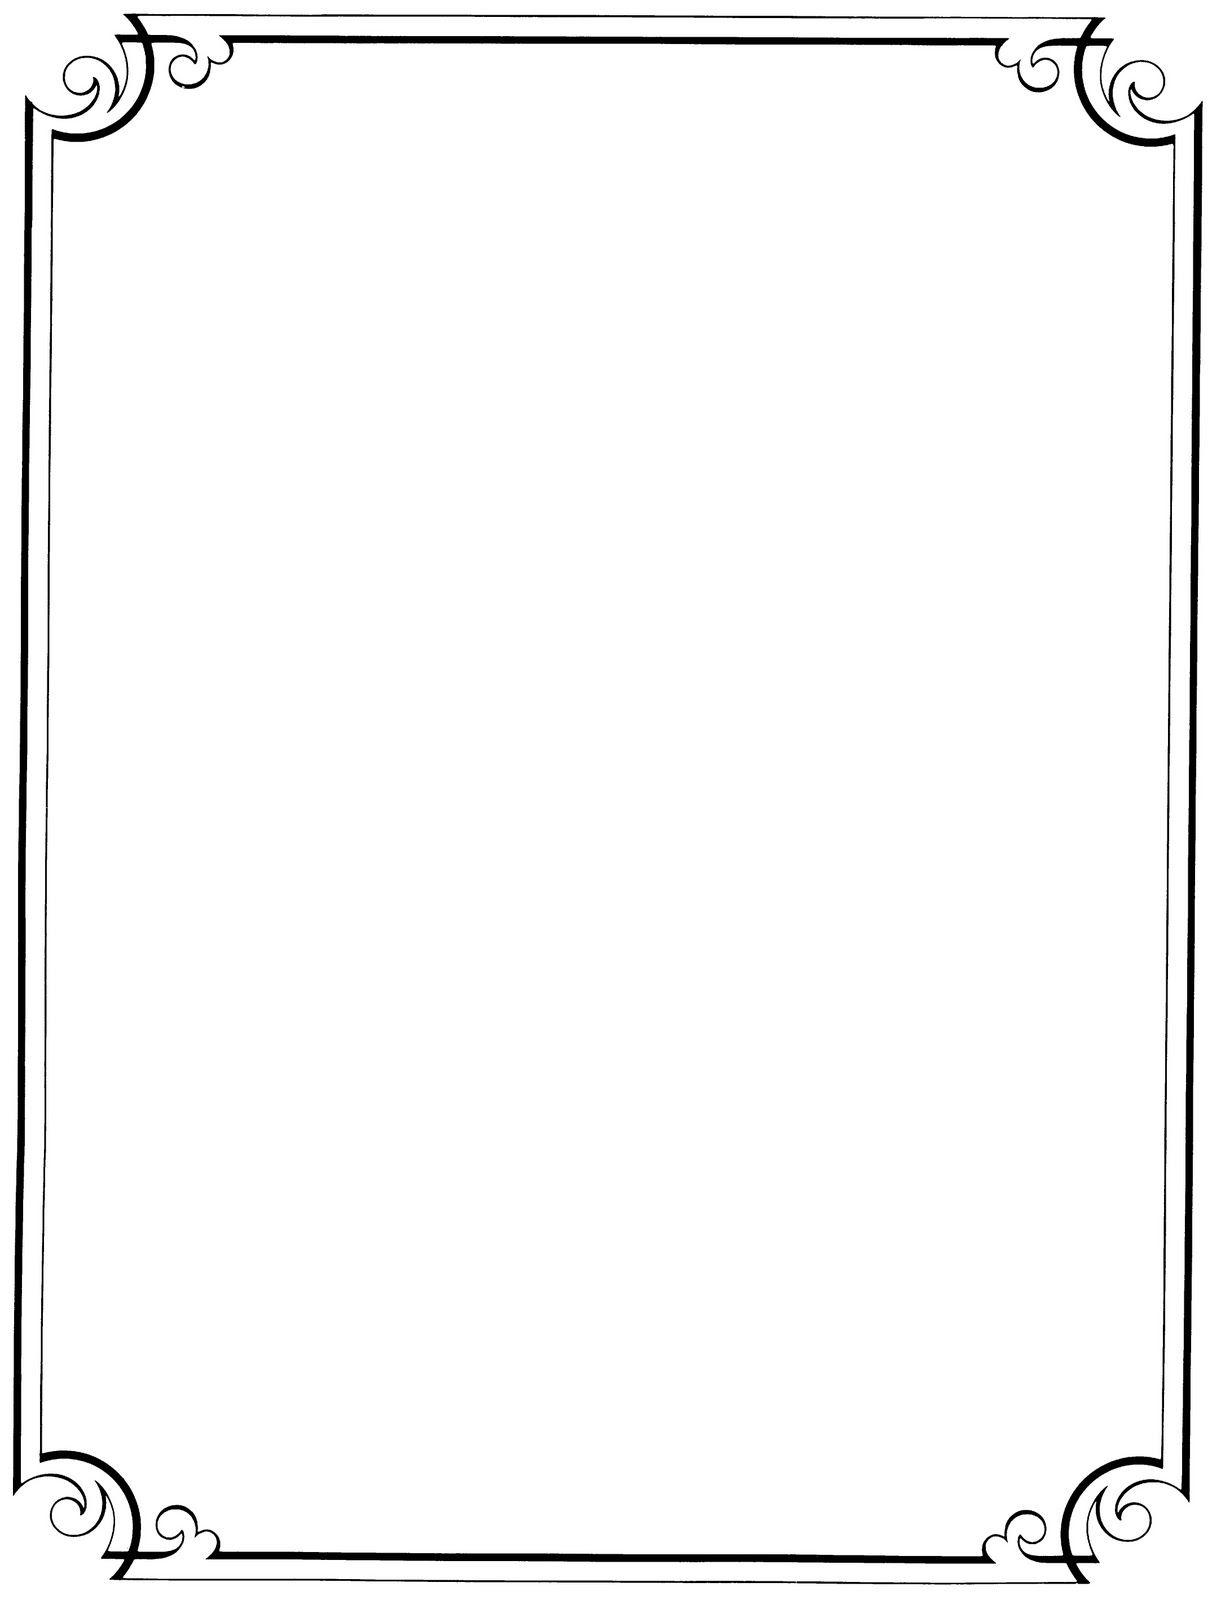 Free Printable Clip Art Borders |  : Free Vintage Clip Art - Free Printable Borders